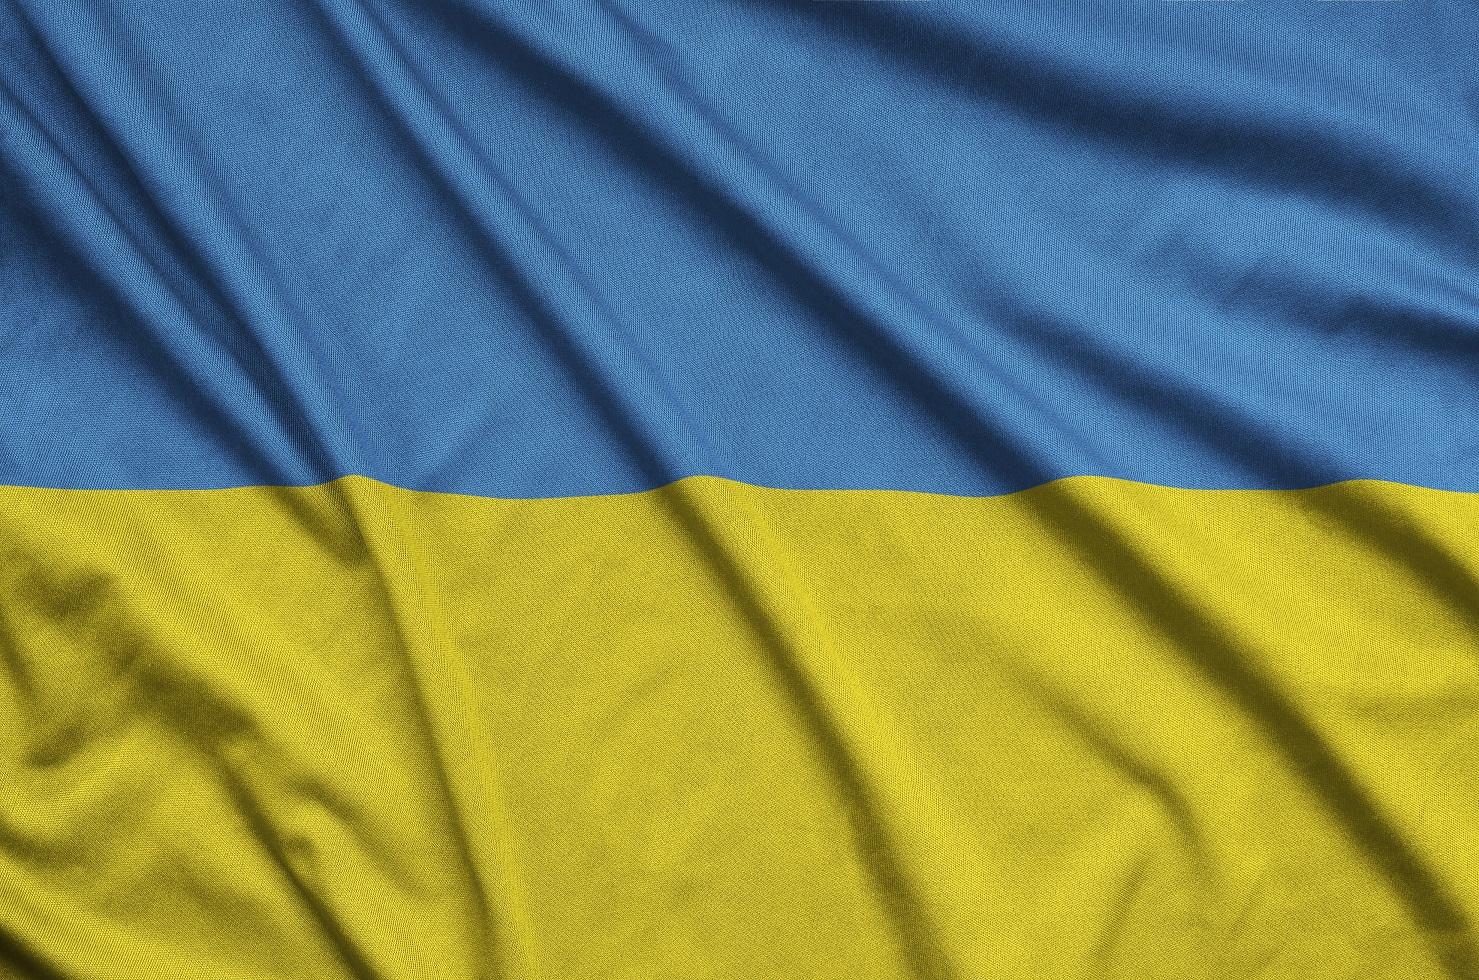 ukraine flag is depicted on a sports cloth fabric KZ3HURJ #новости NEXTA, Ryanair, авиасообщение, Беларусь, киев, Минск, Роман Протасевич, украина